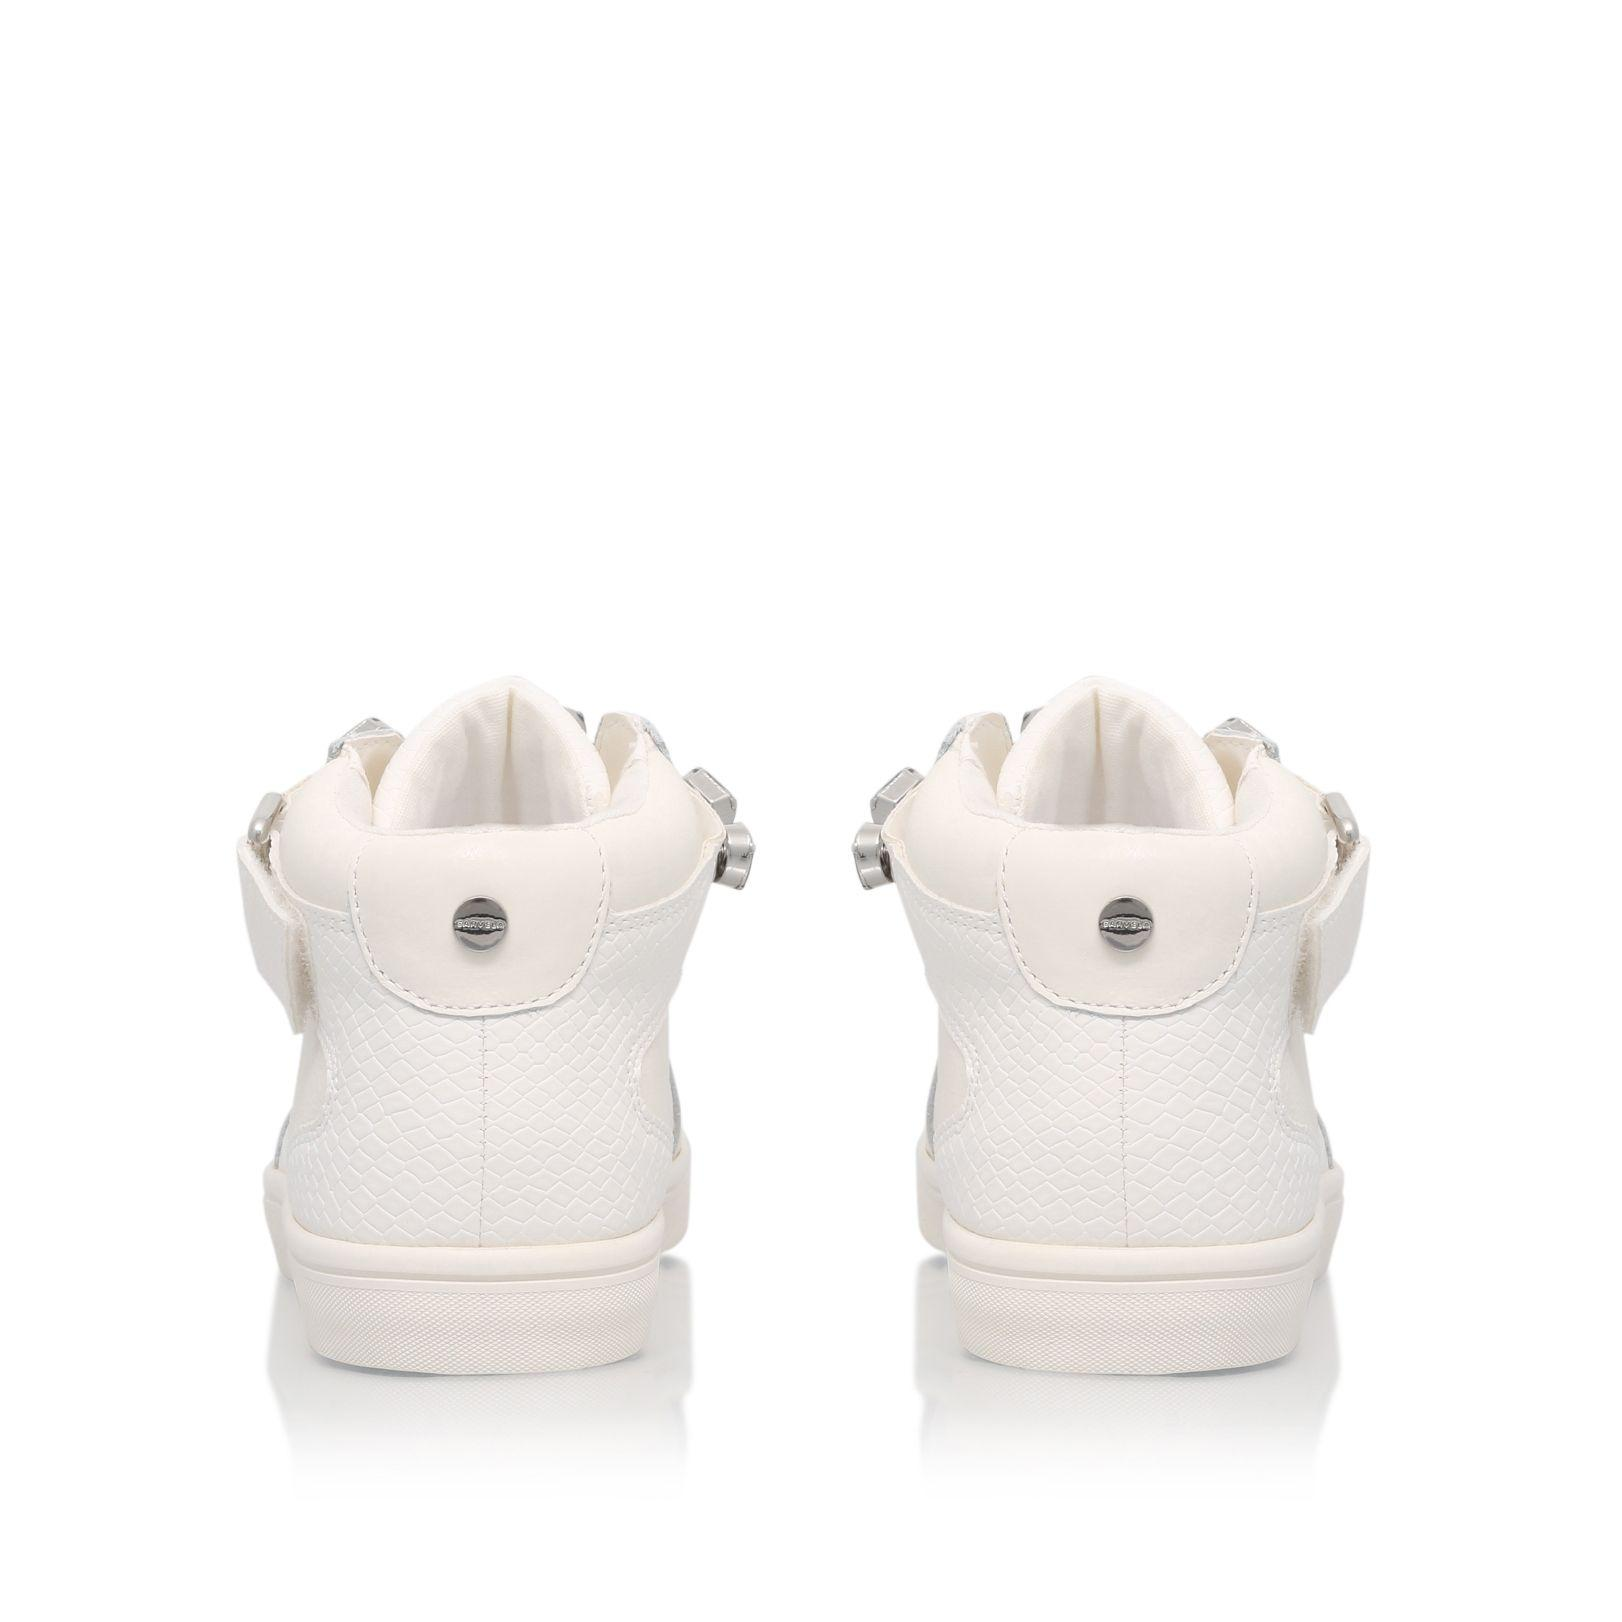 Carvela Kurt Geiger Leather Luminous Embellished Hi Top Boots in White (Black)